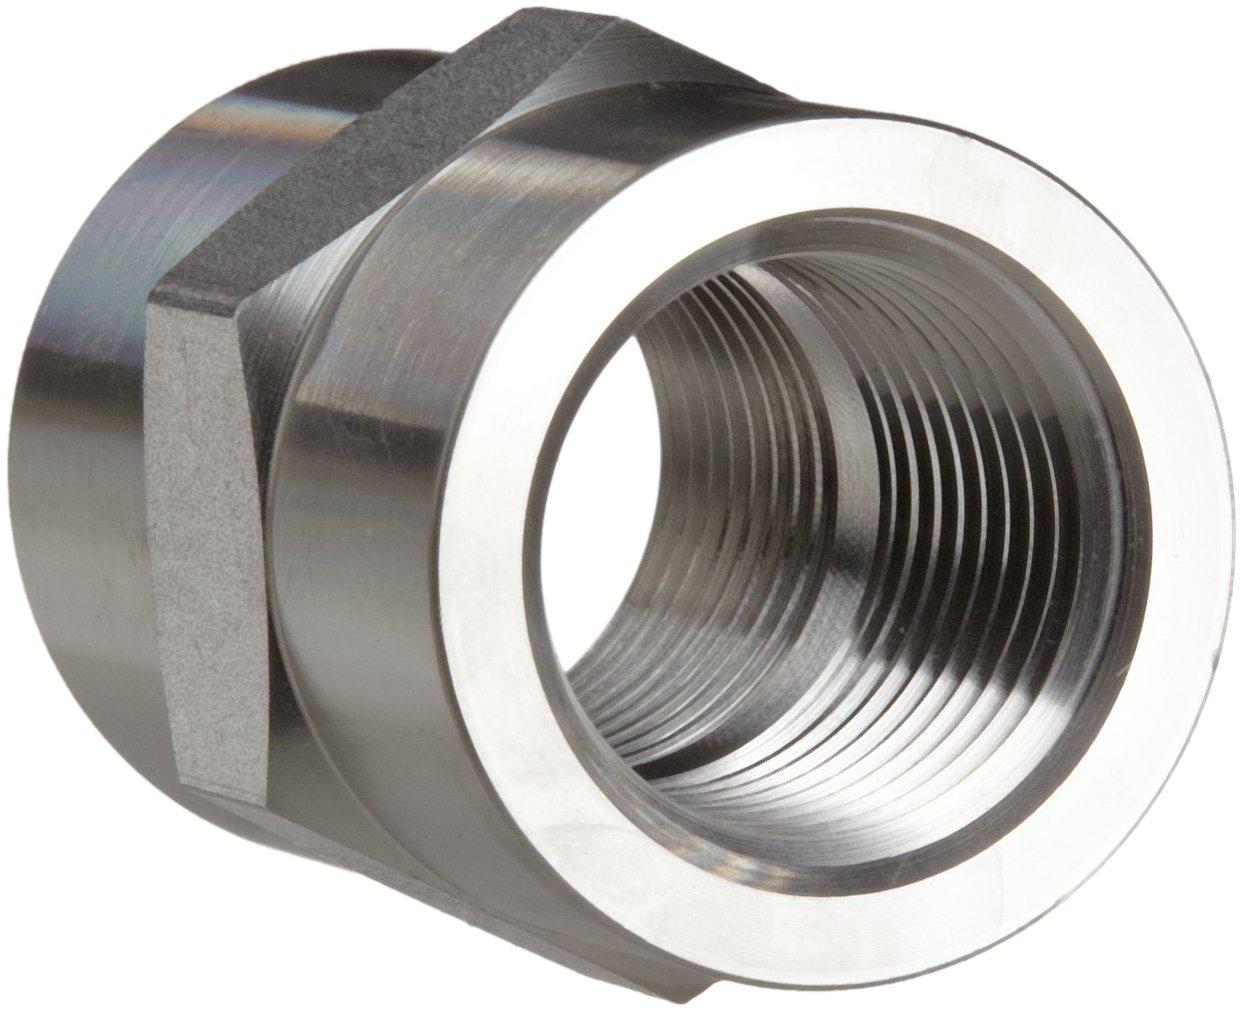 Parker Stainless Steel 316 Pipe Fitting Hex Coupling 1//8 NPT Female X 1//8 NPT Female